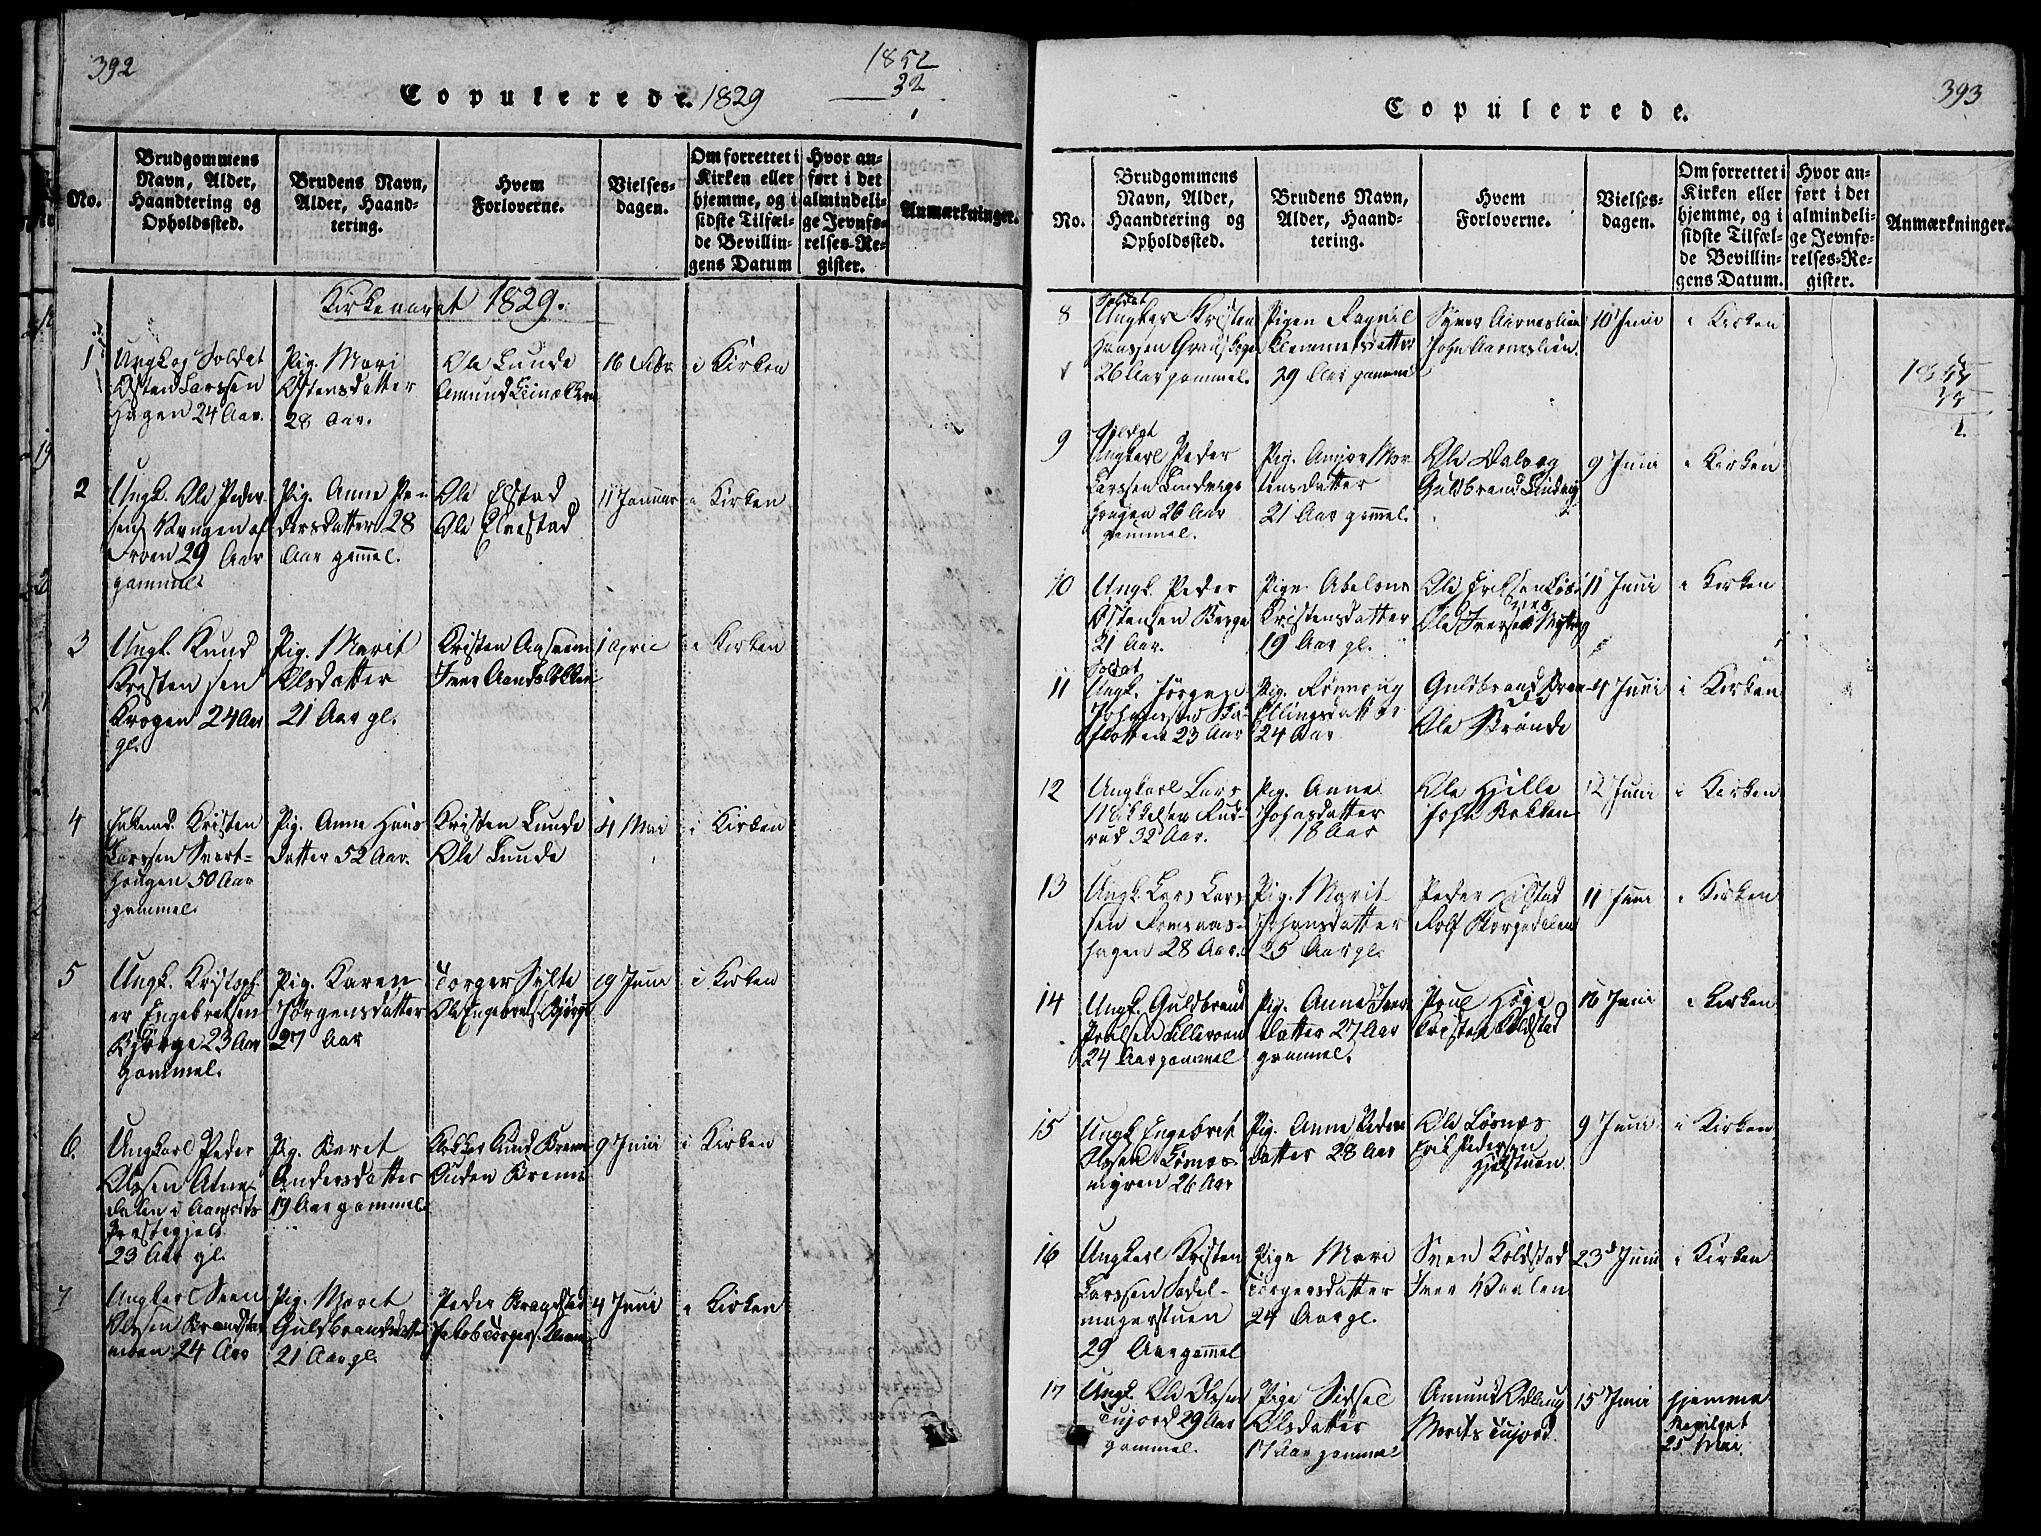 SAH, Ringebu prestekontor, Klokkerbok nr. 1, 1821-1839, s. 392-393